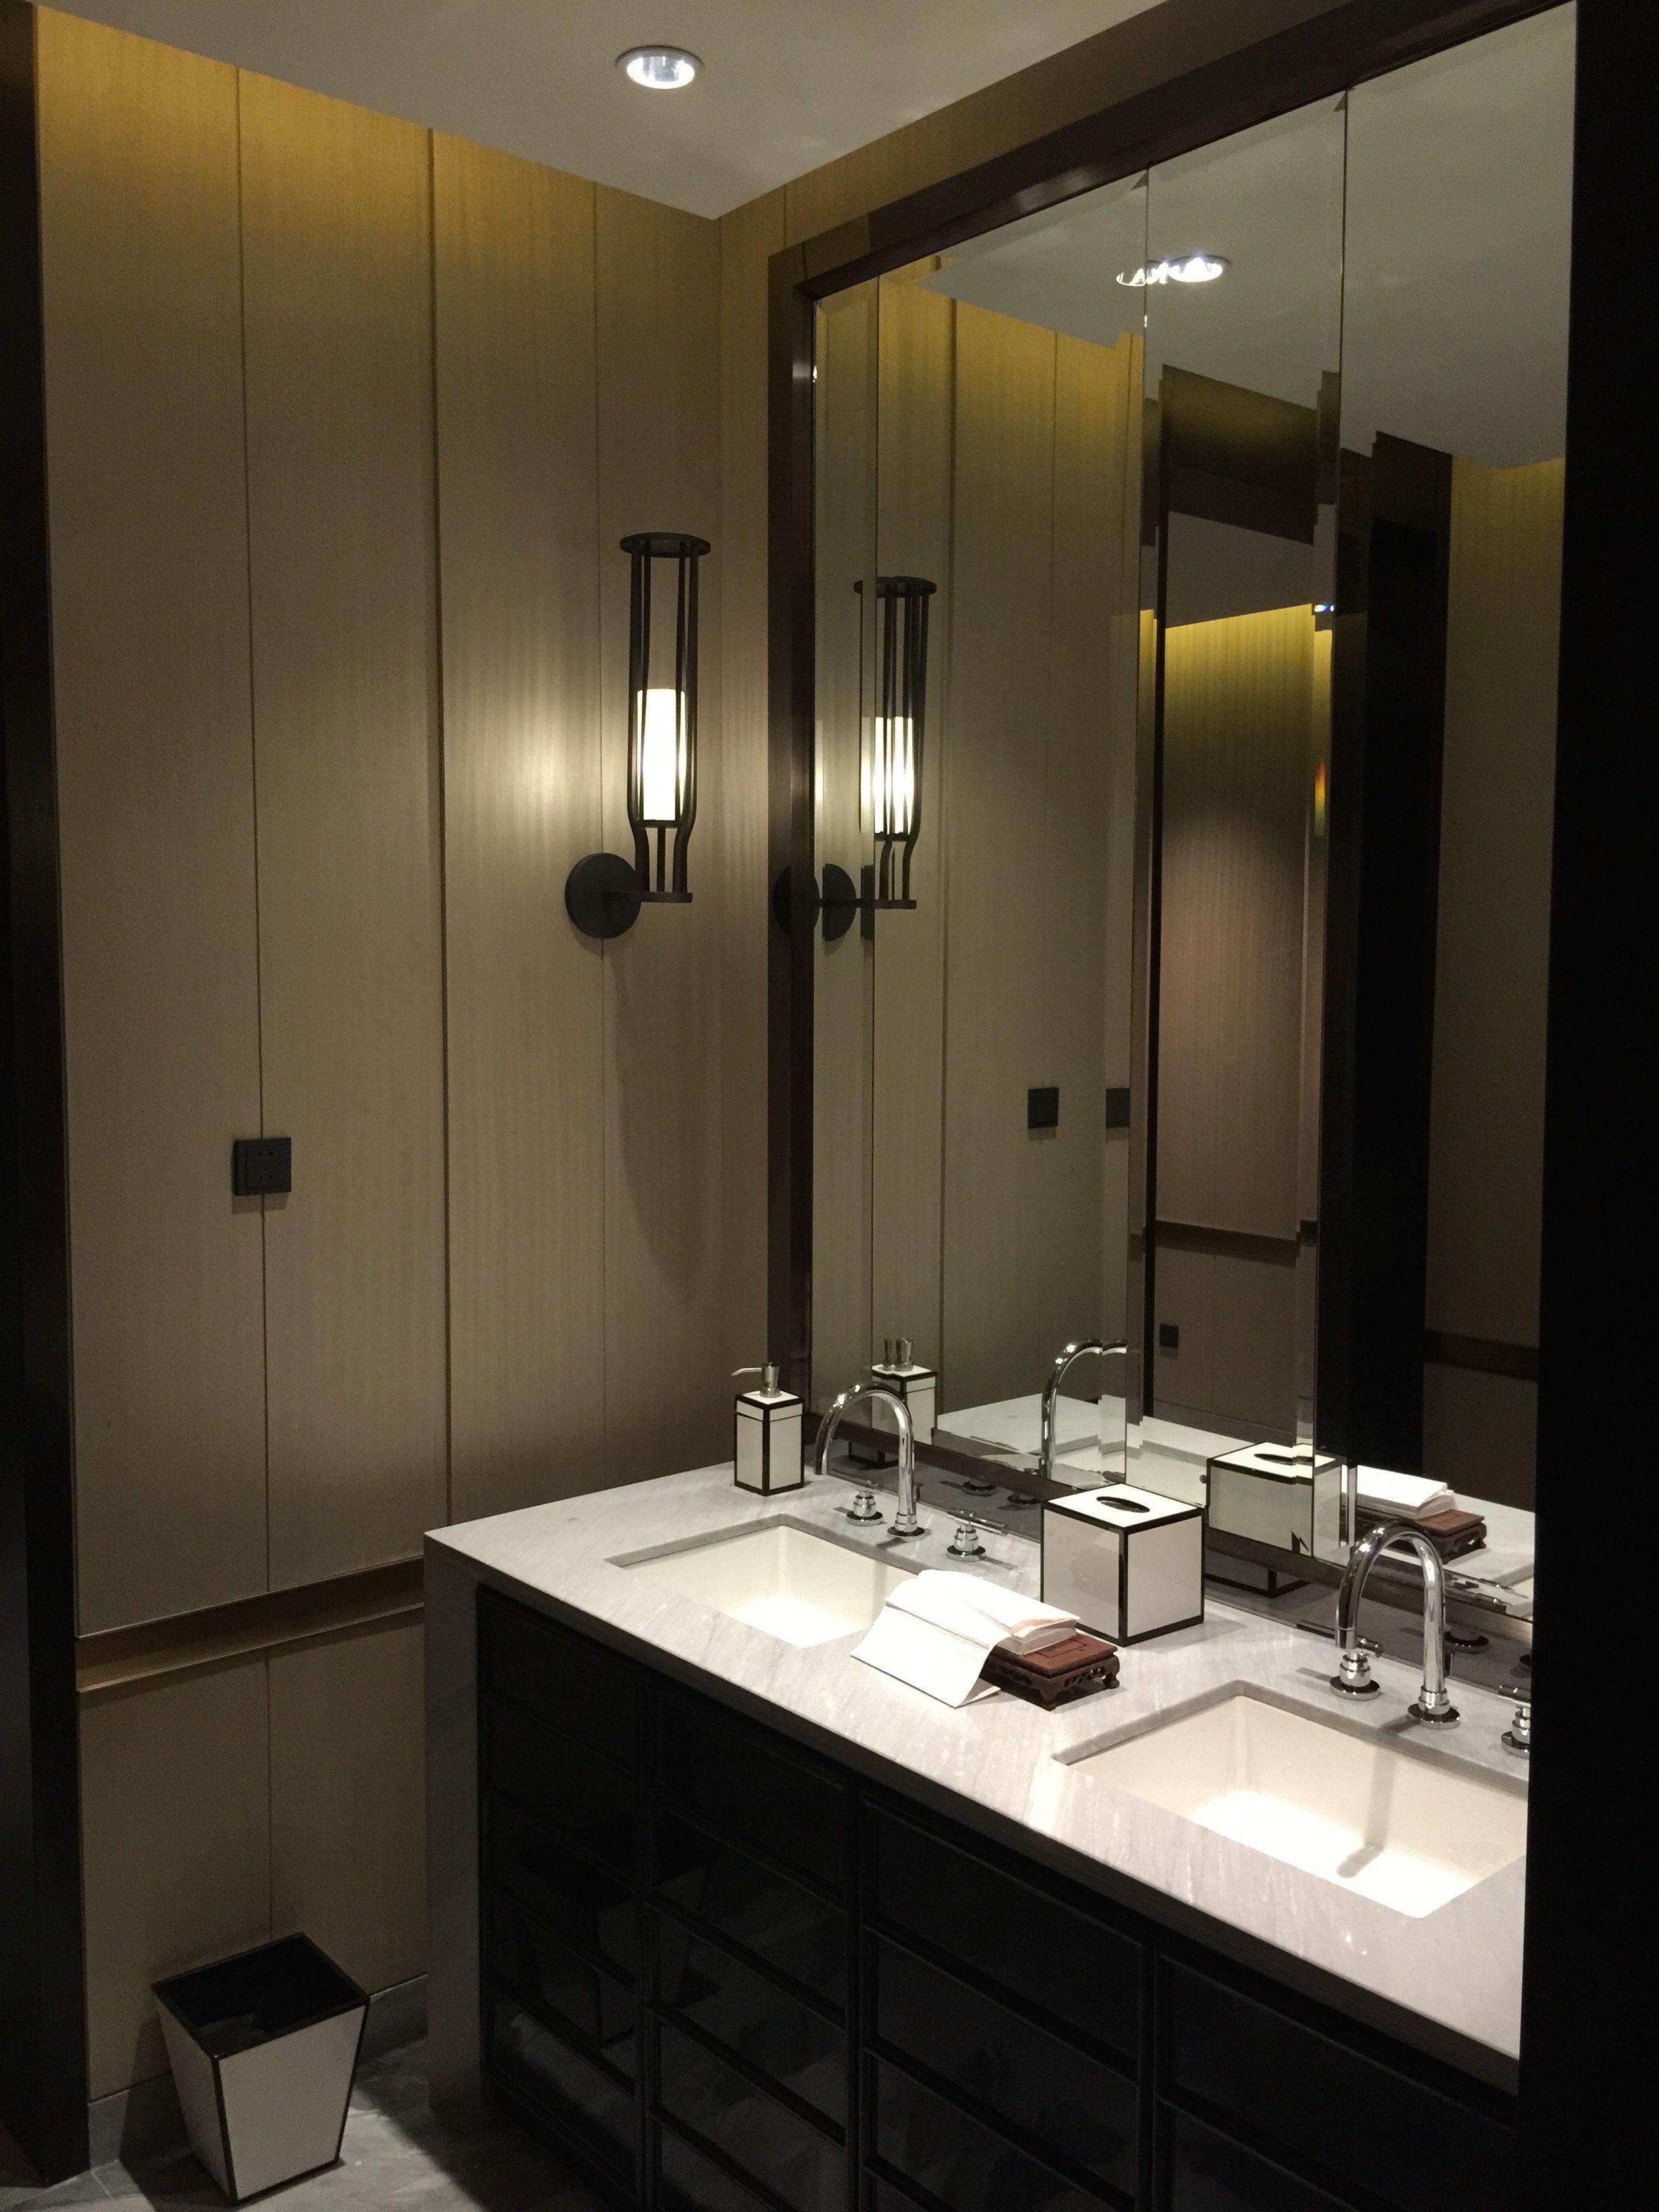 5 Star Hotel Bathroom Luxury Bathroom Hotel Bathroom